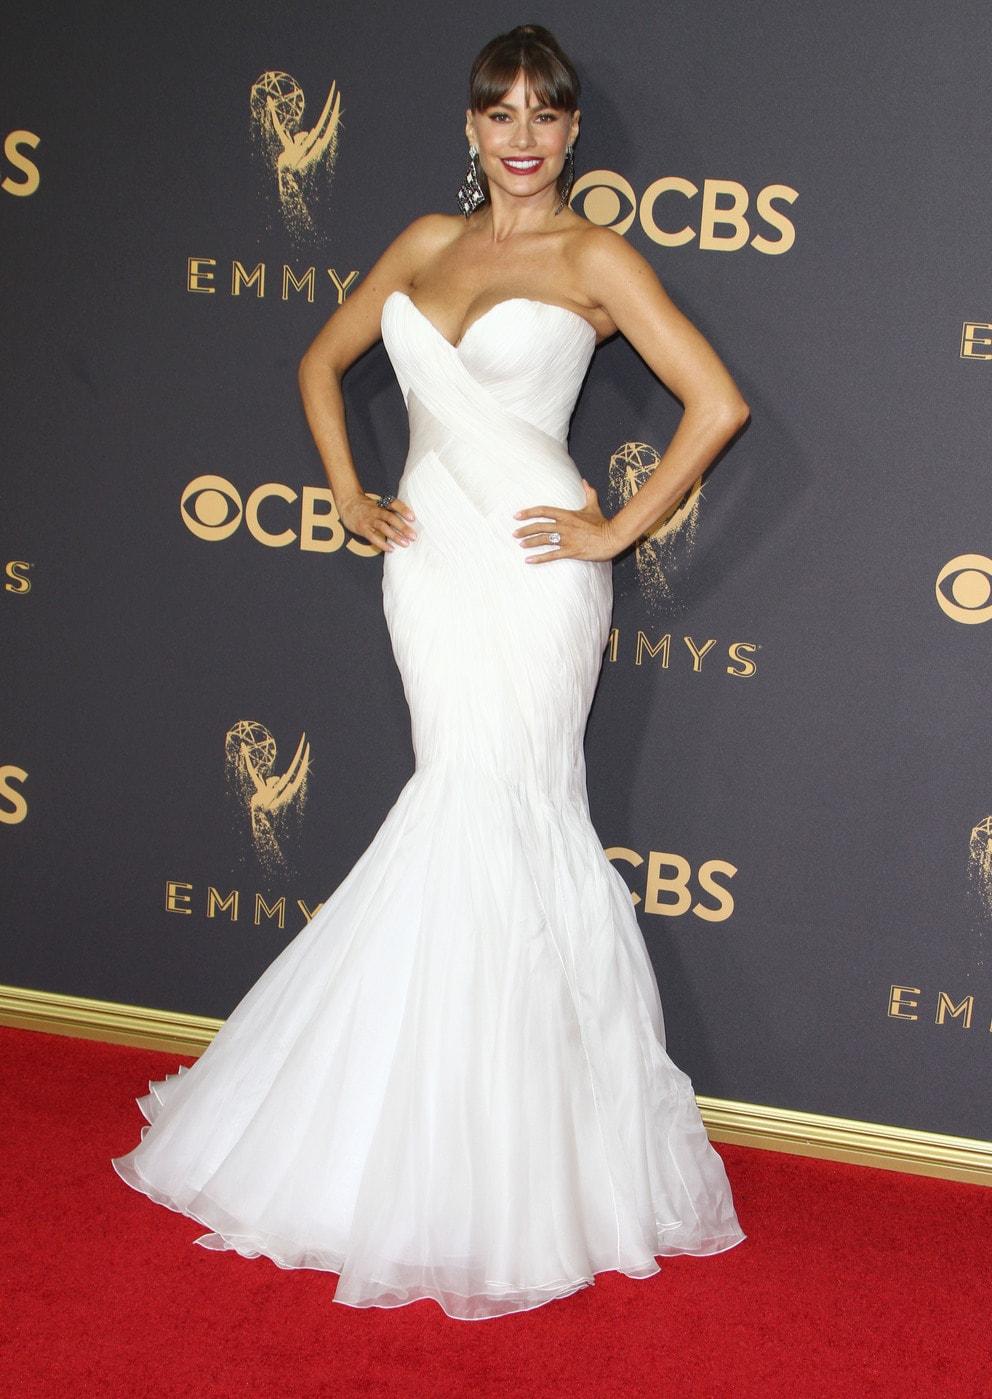 Sofia Vergara in Mark Zunino at the 2017 Emmys